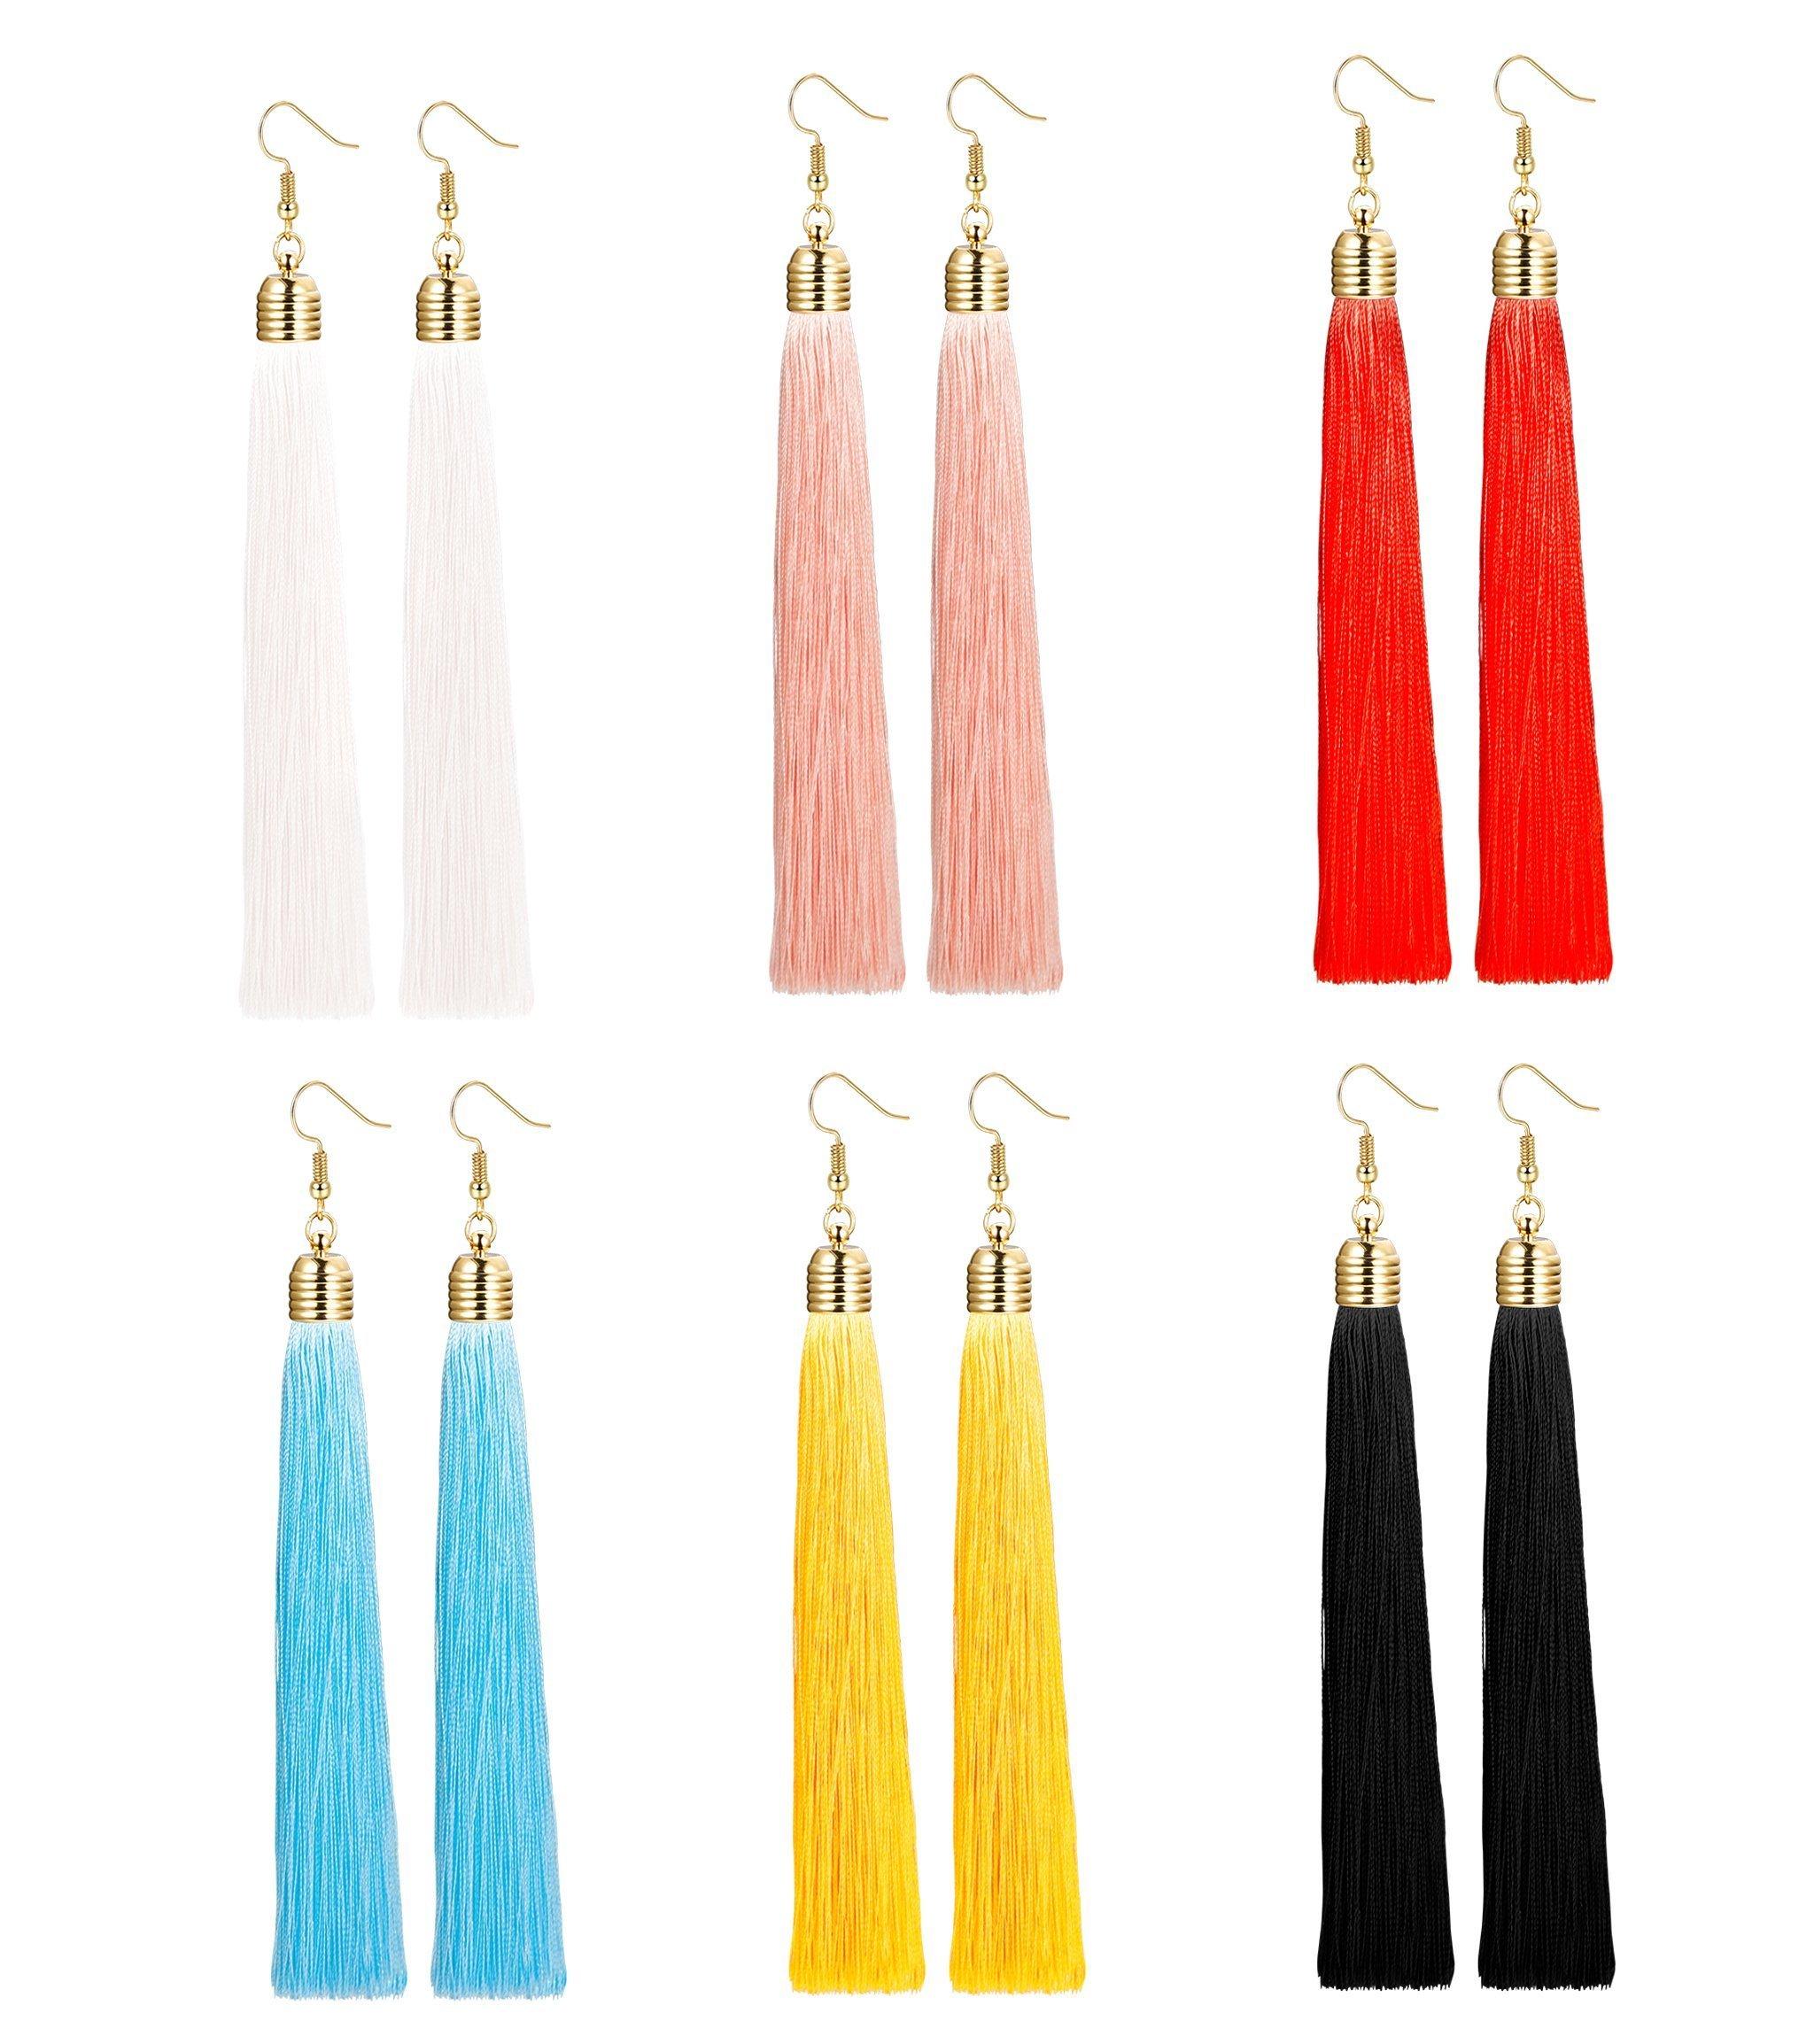 Milacolato 6 Pairs Long Tassel Tiered Thread Statement Tassel Earrings for Women Girls Dangle Fringe Drop Earrings Elegant Long